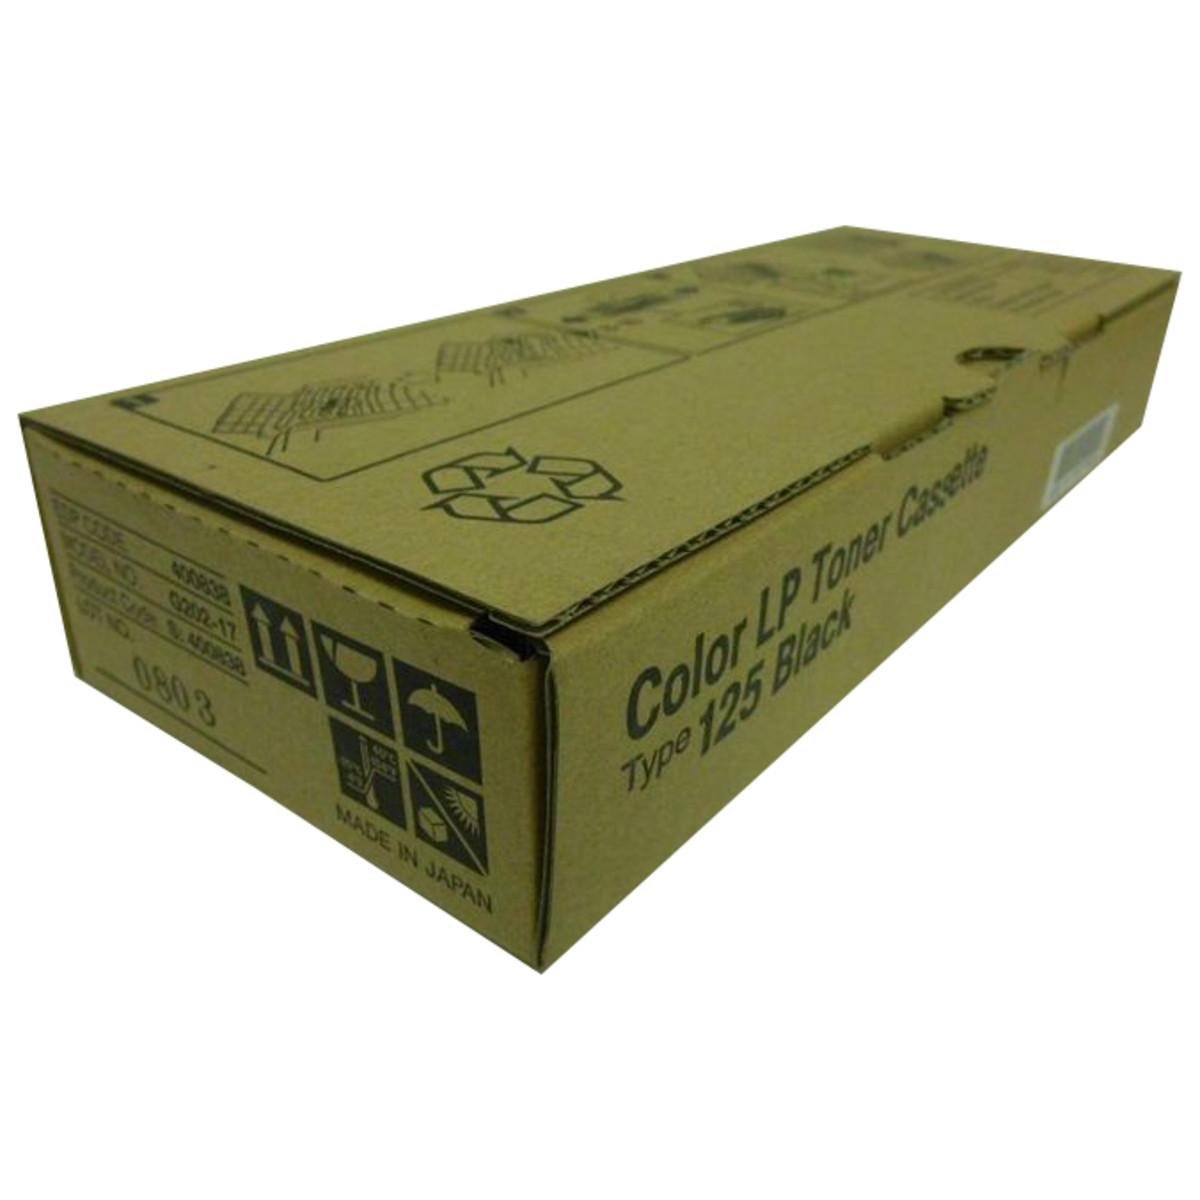 Lanier 400-838 Black Toner Cartridge